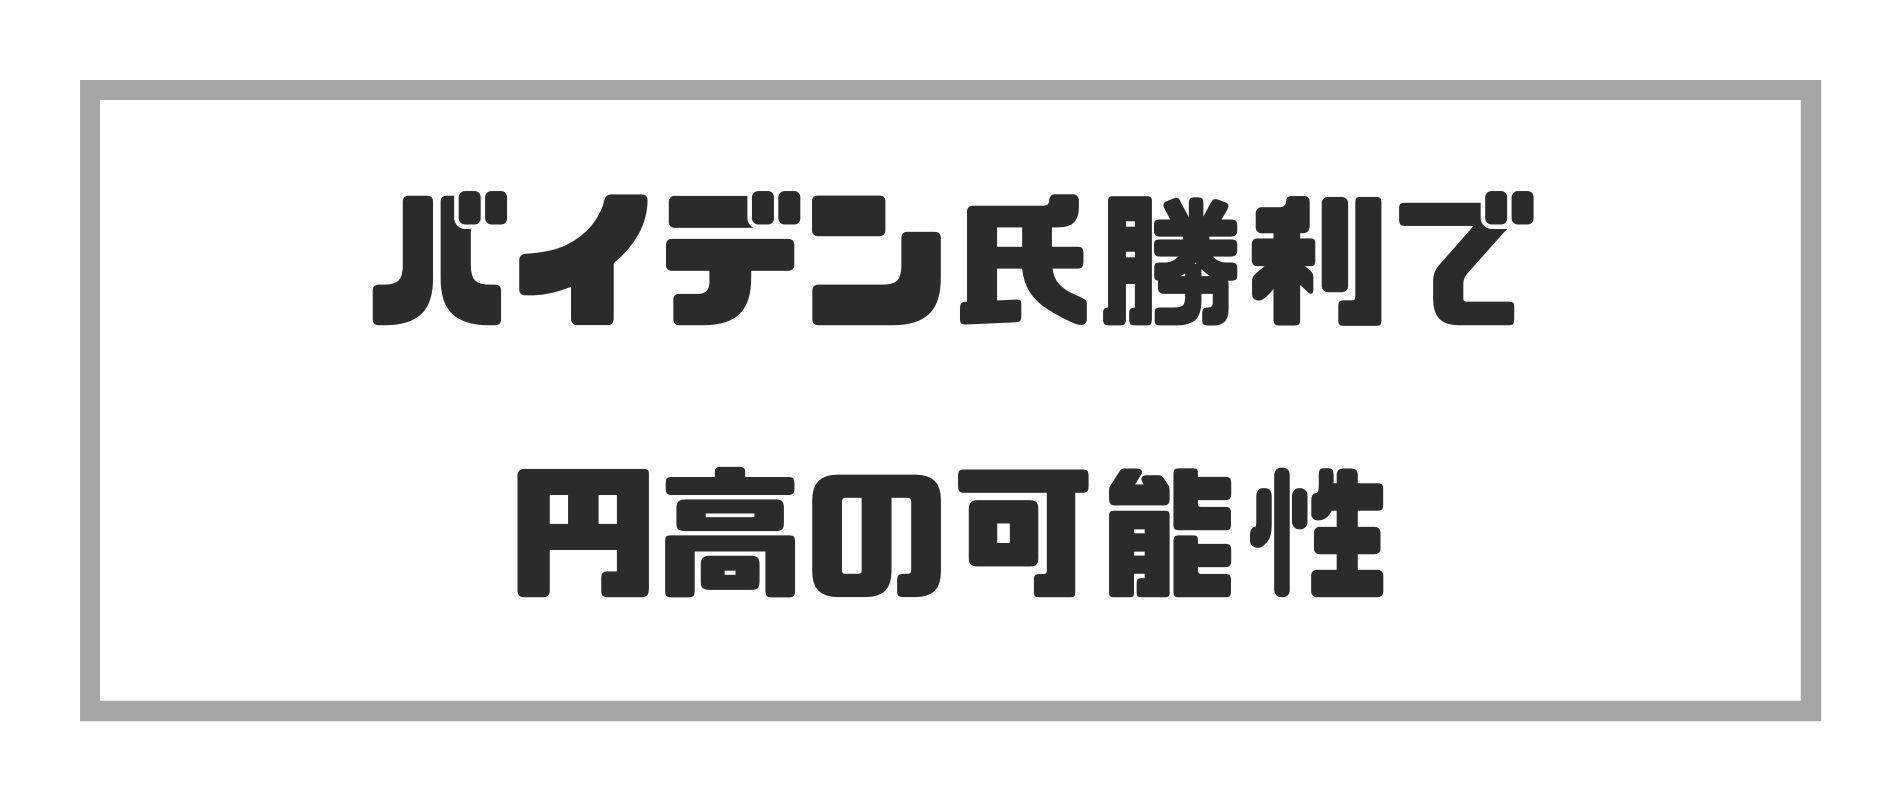 FX儲かる_バイデン氏勝利で円高の可能性